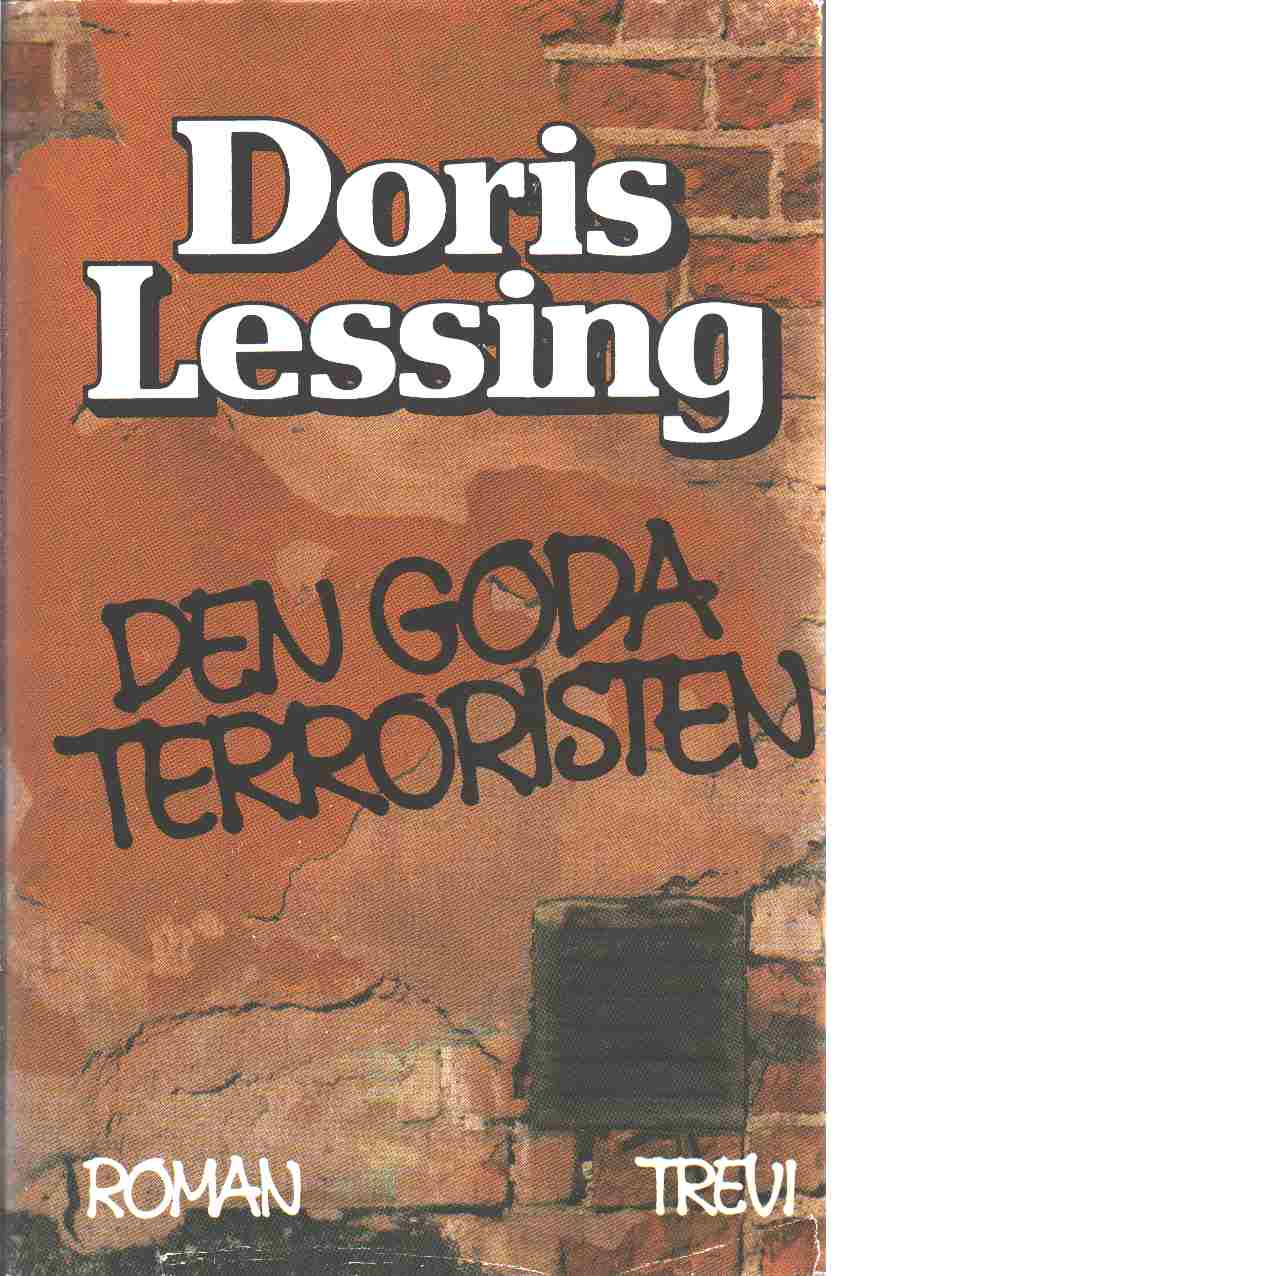 Den goda terroristen - Lessing, Doris